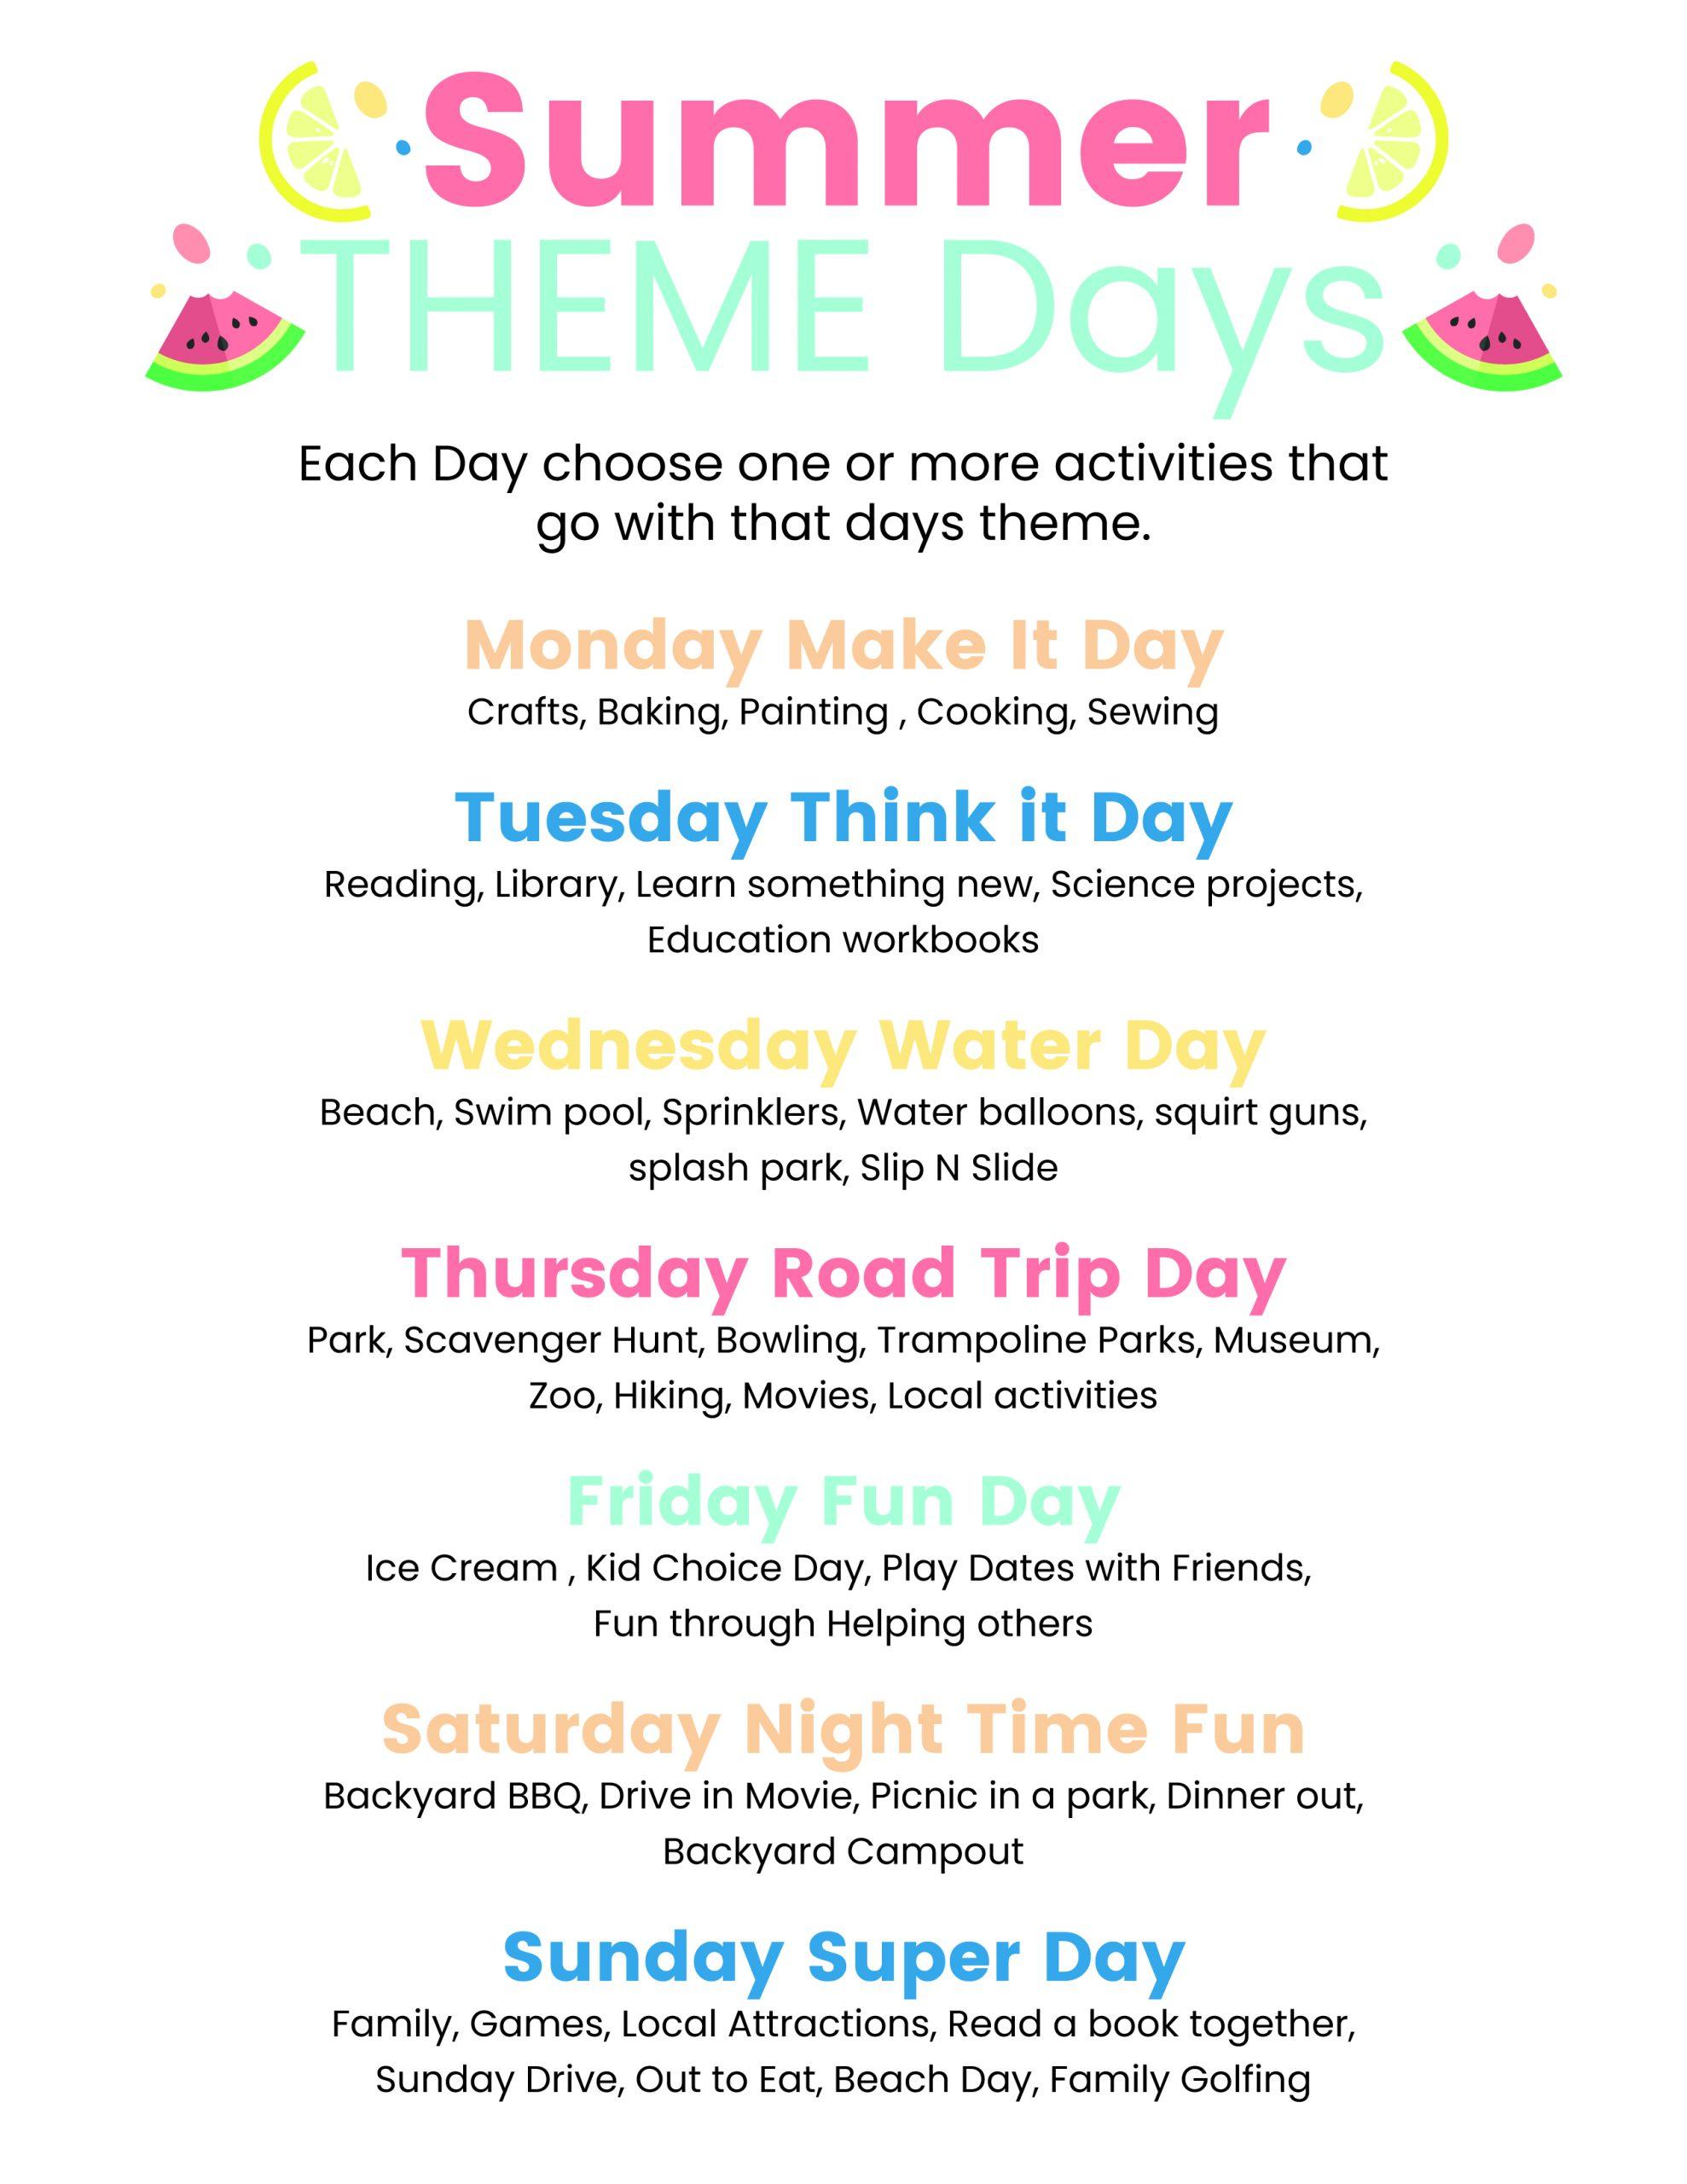 Day 41- Summer Theme Days plus FREE Printable {100 Days of Summer Fun}